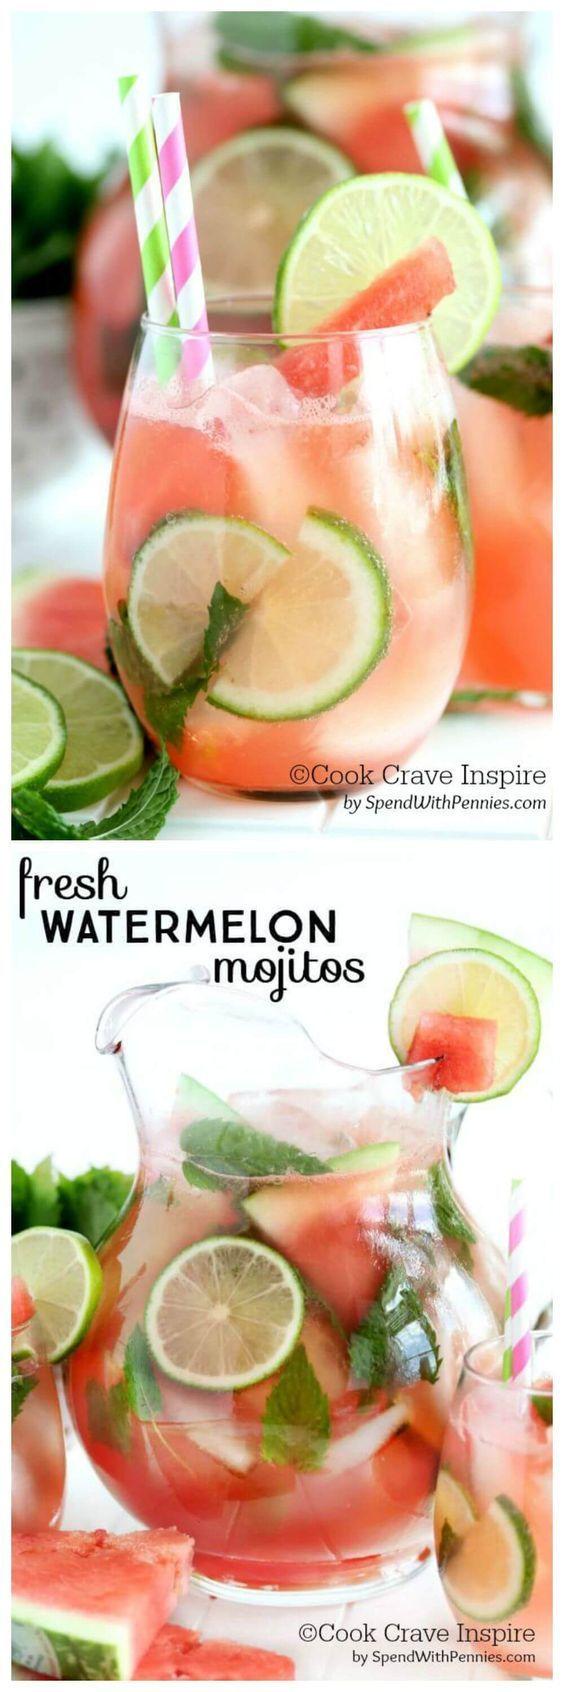 Mojito pastèque #mojitos  #cocktails